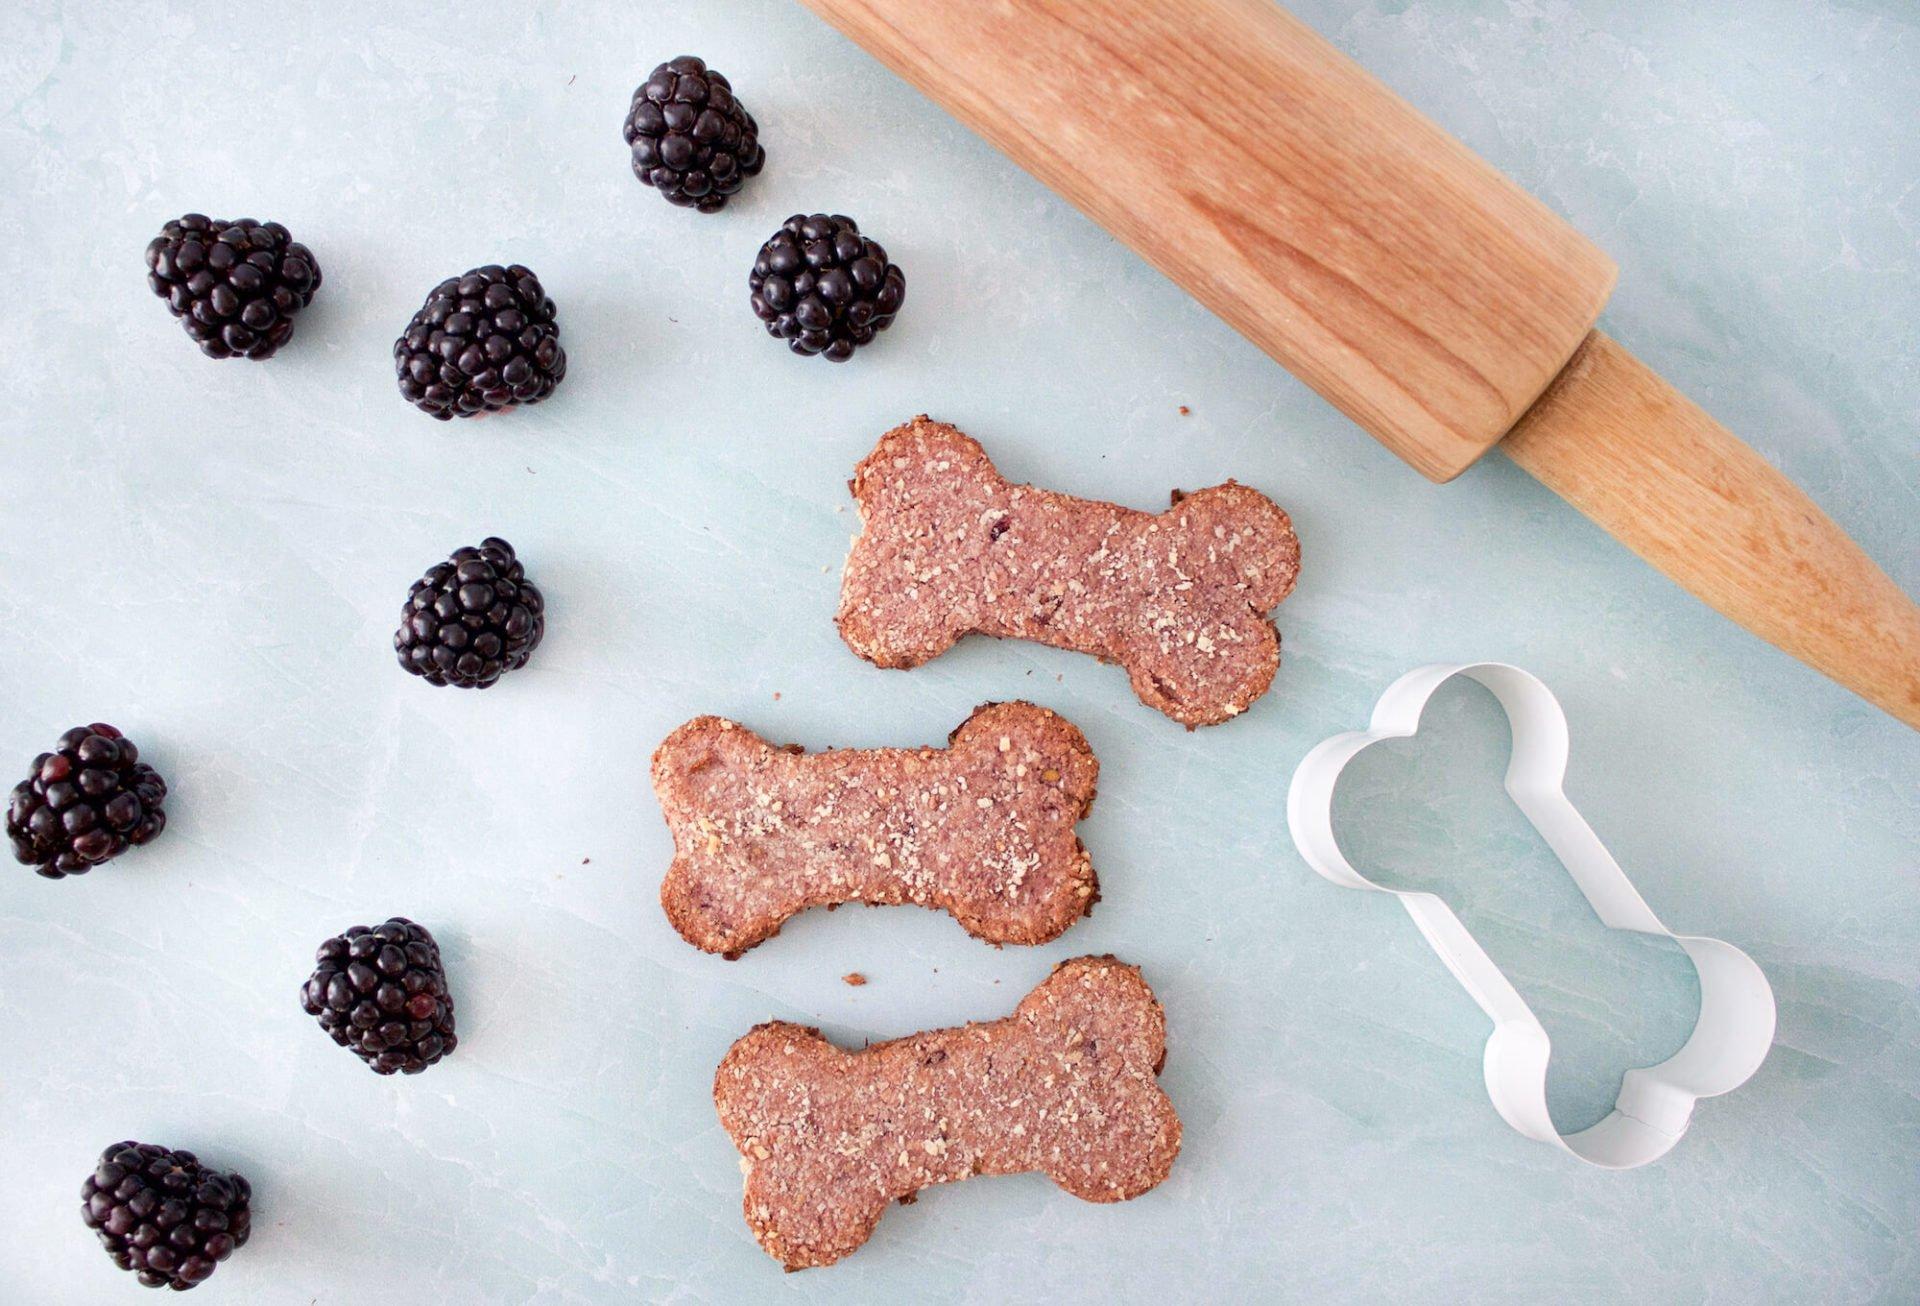 Gluten-Free Blackberry & Almond Flour Dog Treats